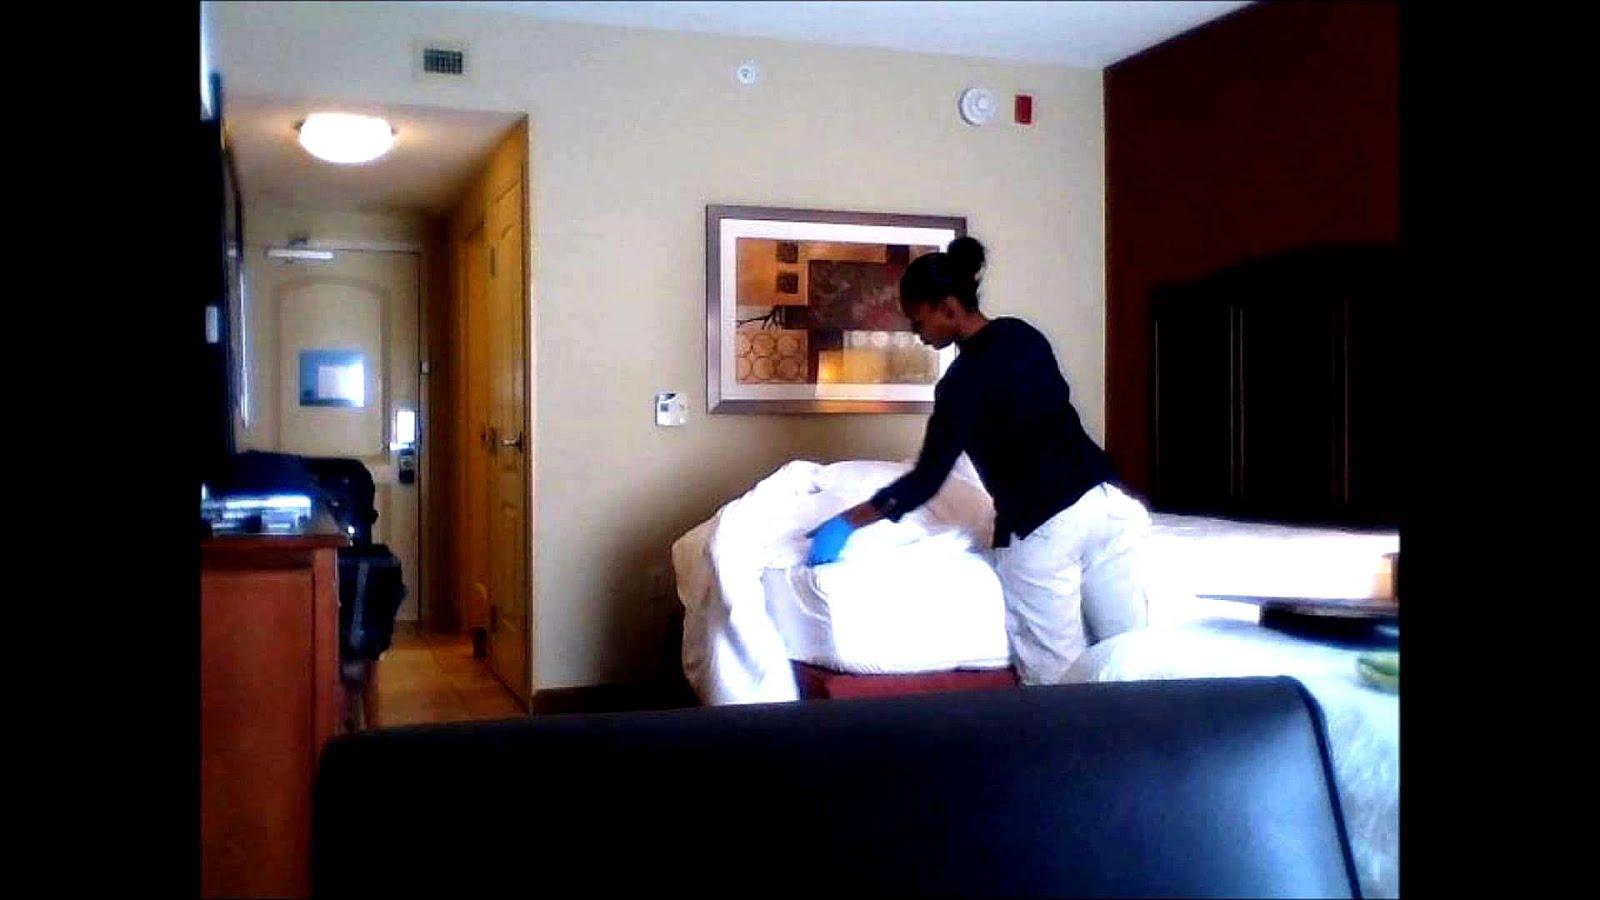 Hotel Hidden Cameras - Camera Choices